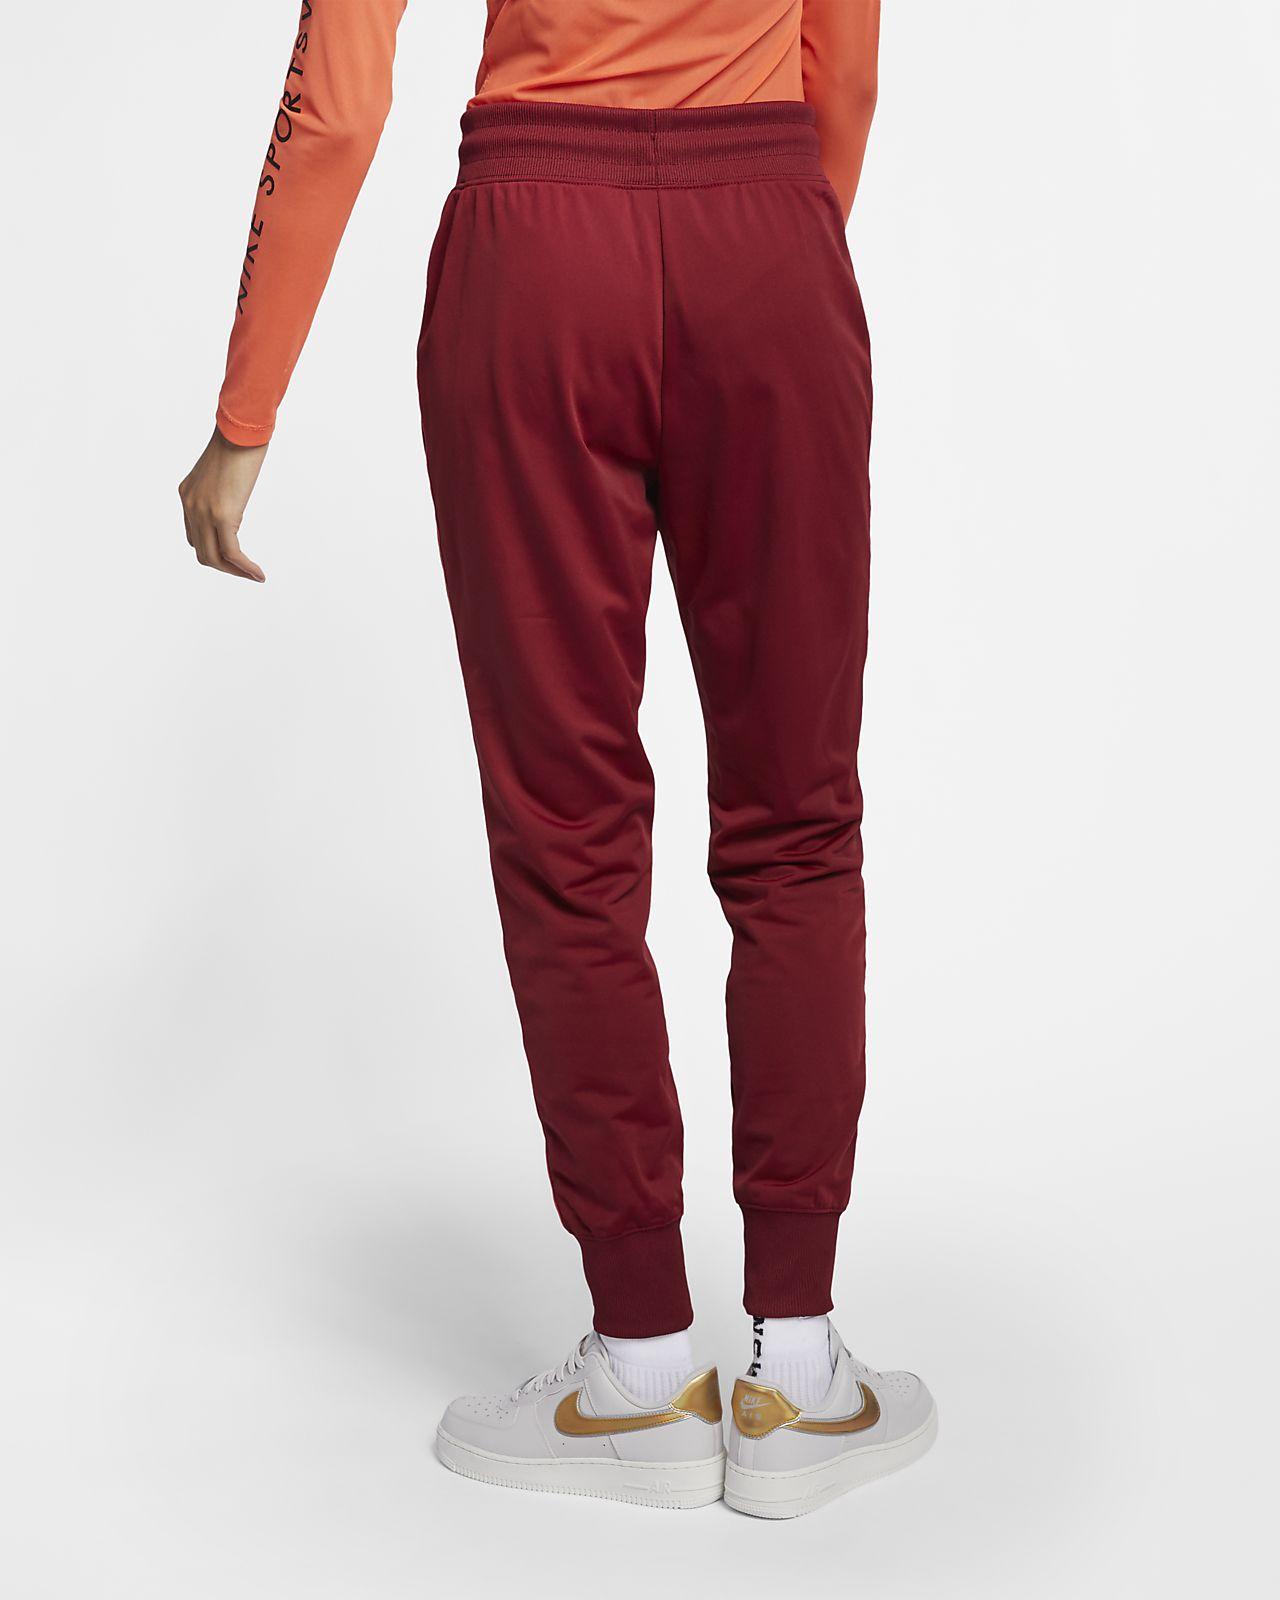 5bd28a3db617 Low Resolution Nike Sportswear Heritage Women s Joggers Nike Sportswear  Heritage Women s Joggers